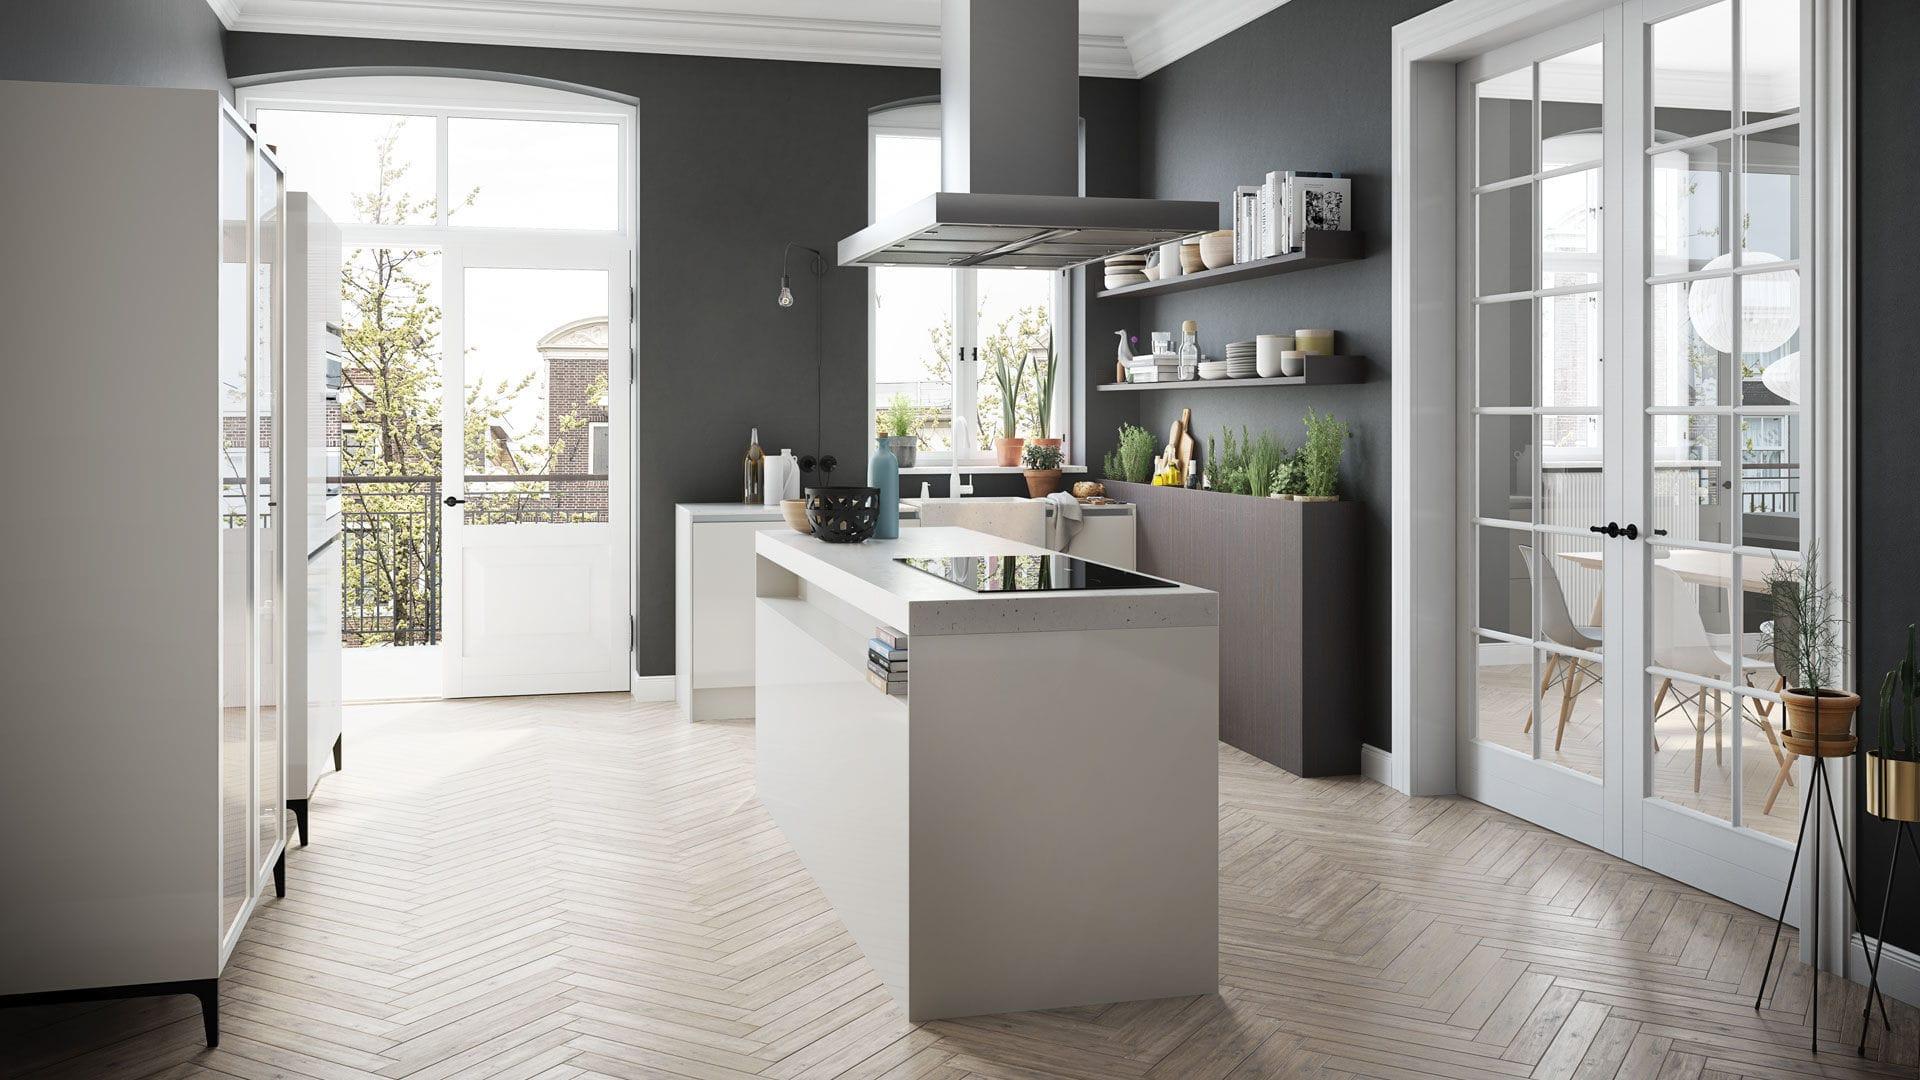 Moderne Küche / lackiertes Holz / Kochinsel / ohne Griff - URBAN ...